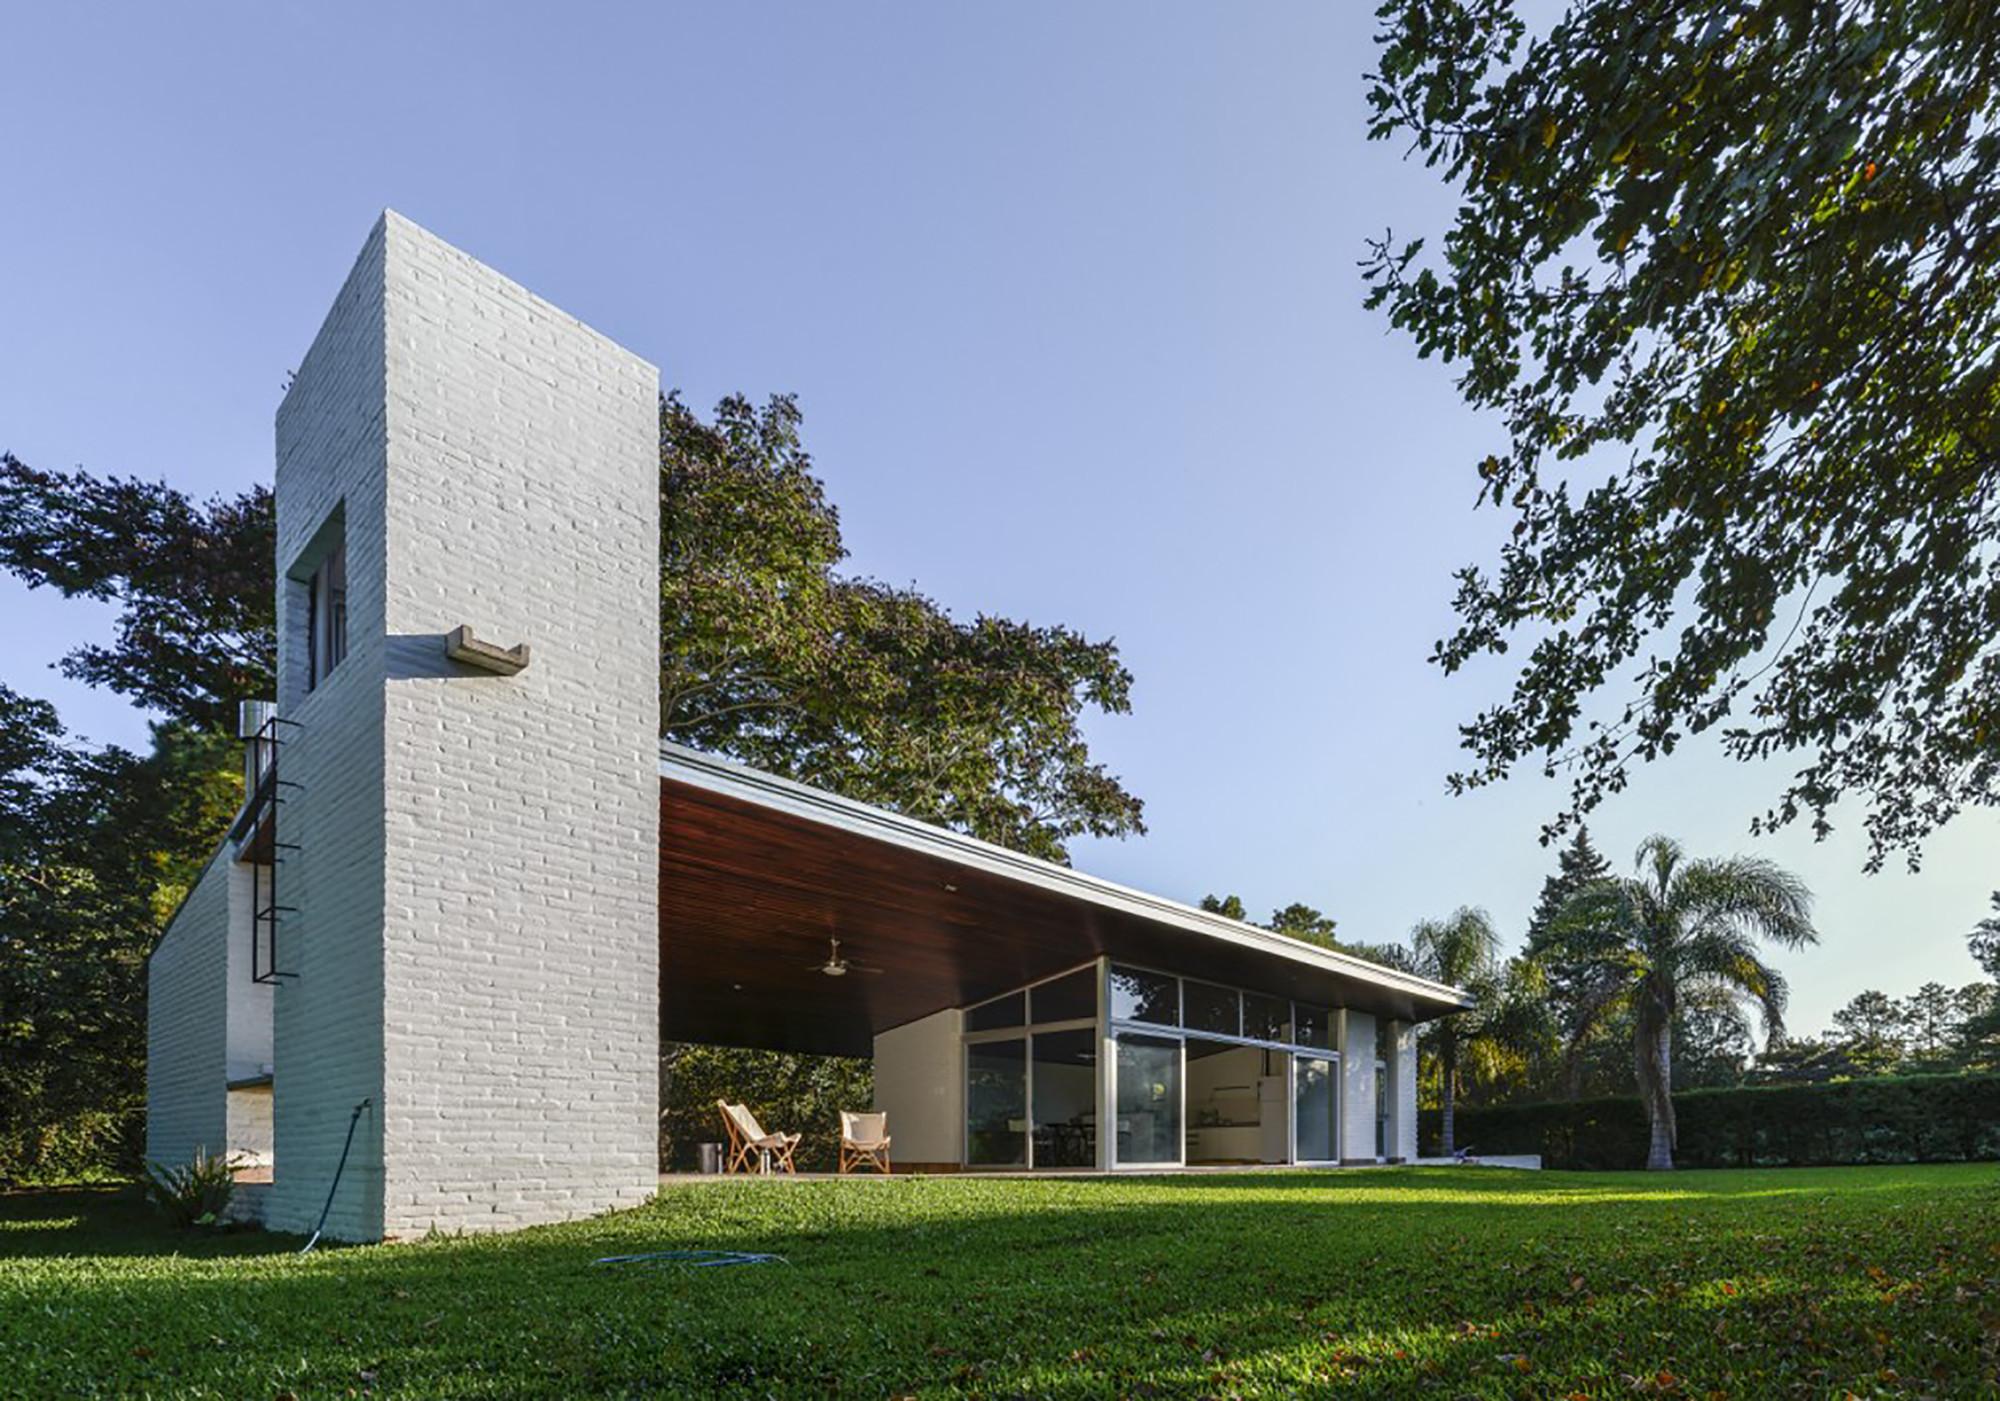 House in Los Molinos  / BIAGIONI_PECORARI Arquitectos, © Ramiro Sosa